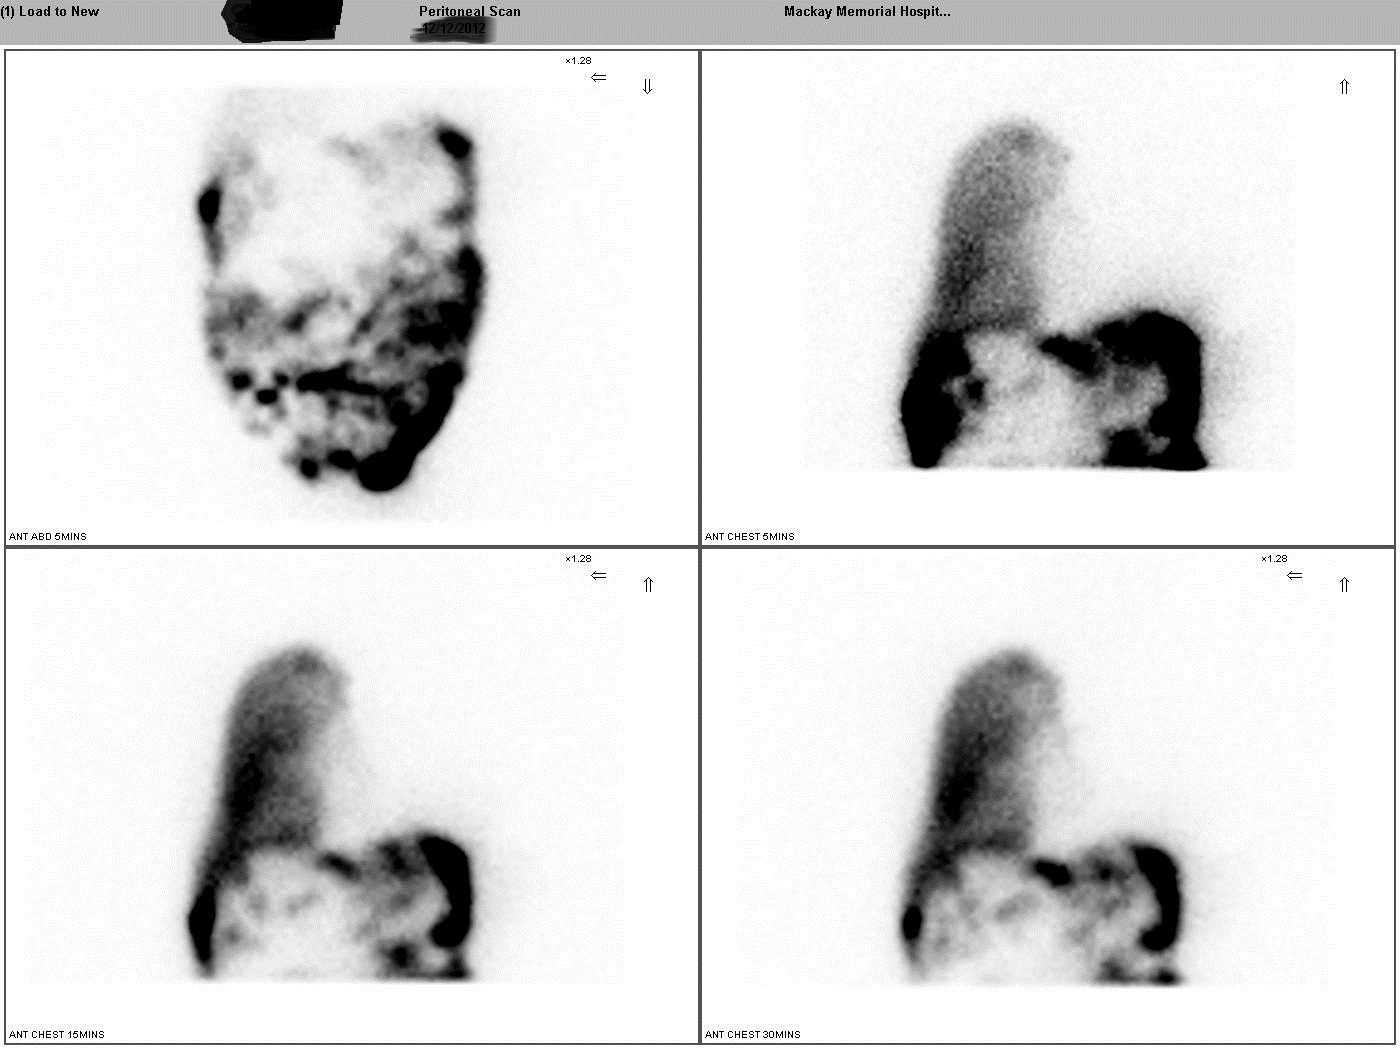 Case Report: Repair of diaphragm defect in Hepatic Hydrothorax